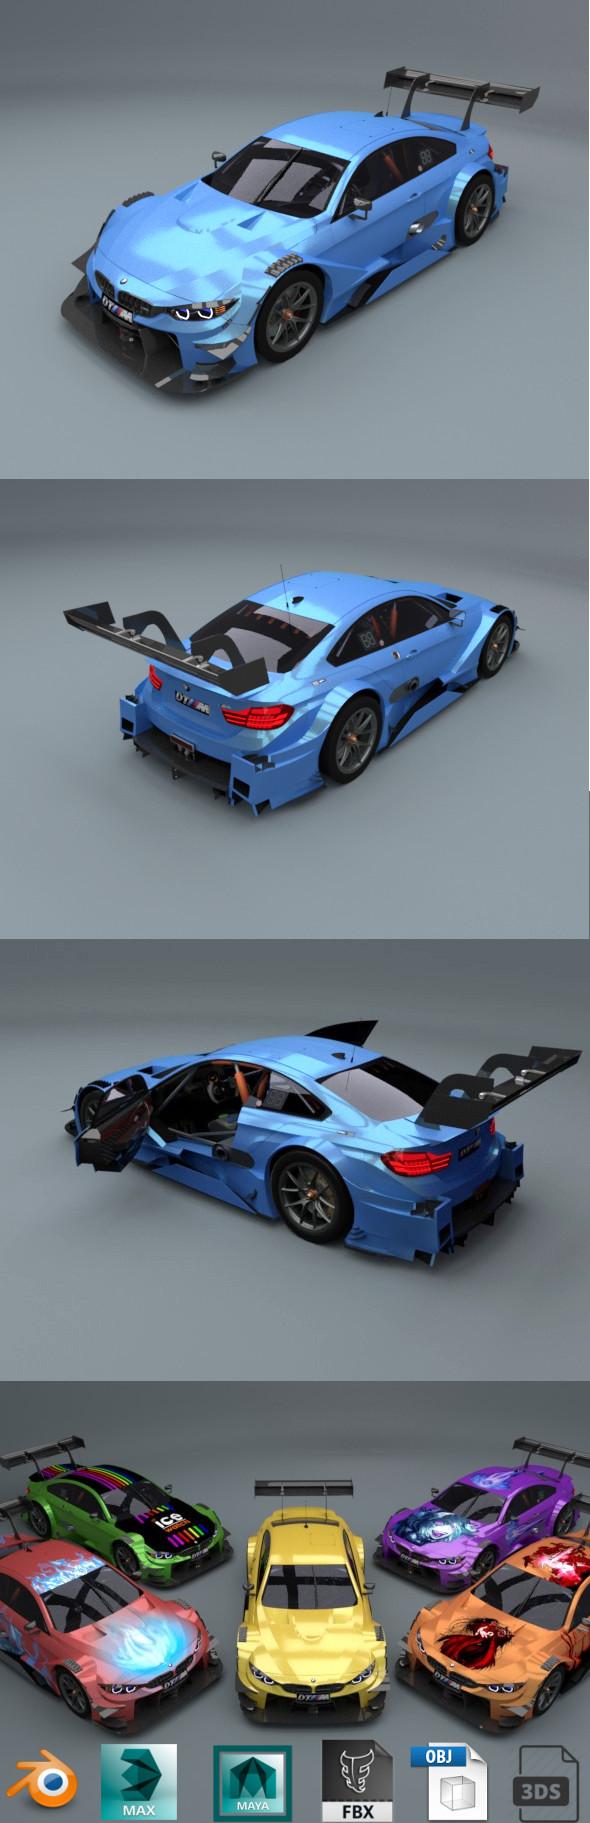 bmw m4 dtm 2017 low poly car - 3DOcean Item for Sale